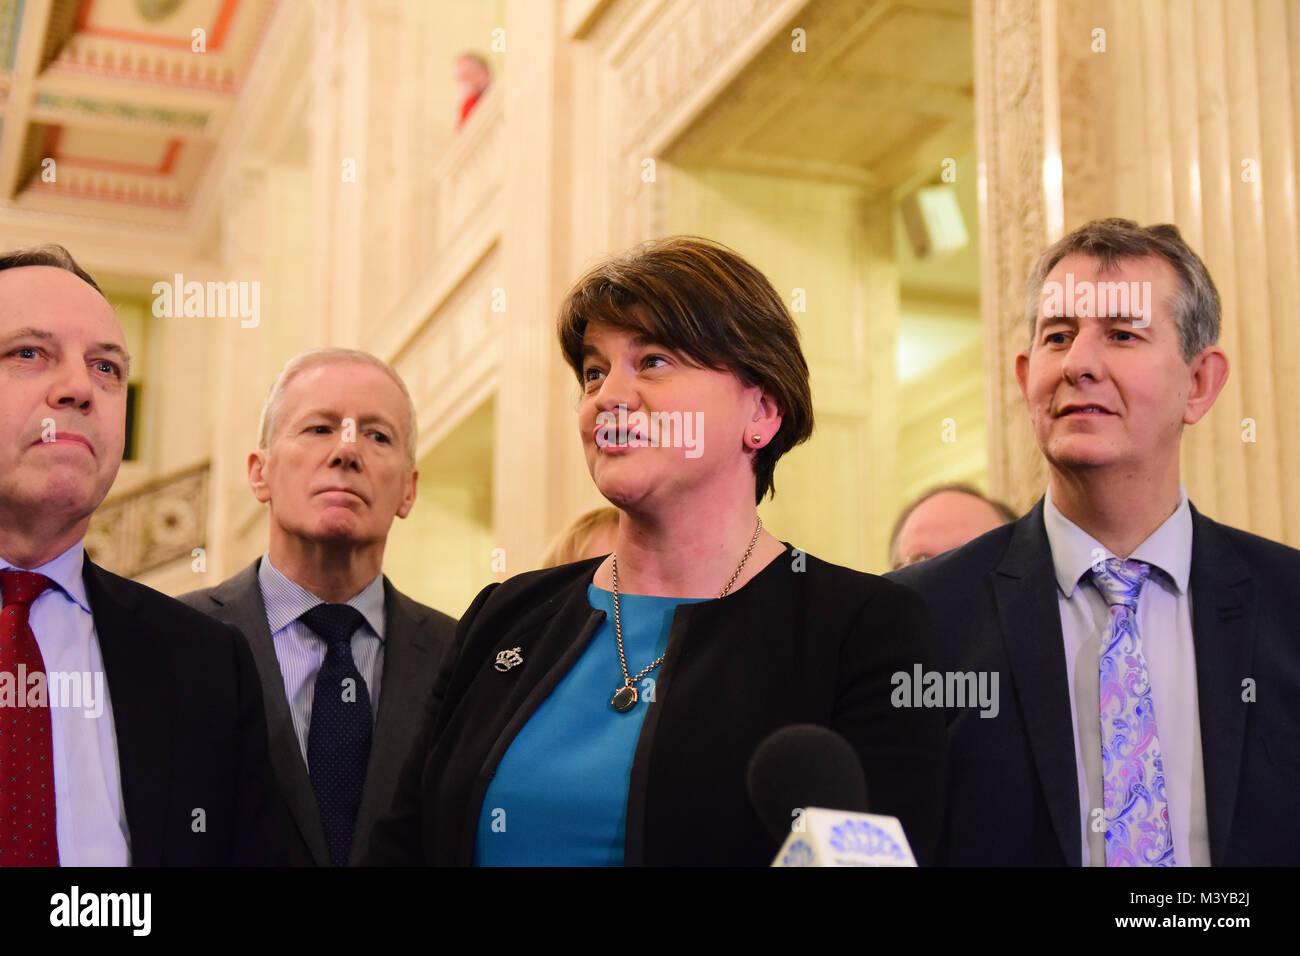 Belfast, UK. 12th Feb, 2018. DUP Party Leader Arlene Foster addresses  media during assembly talks. Belfast: UK: - Stock Image